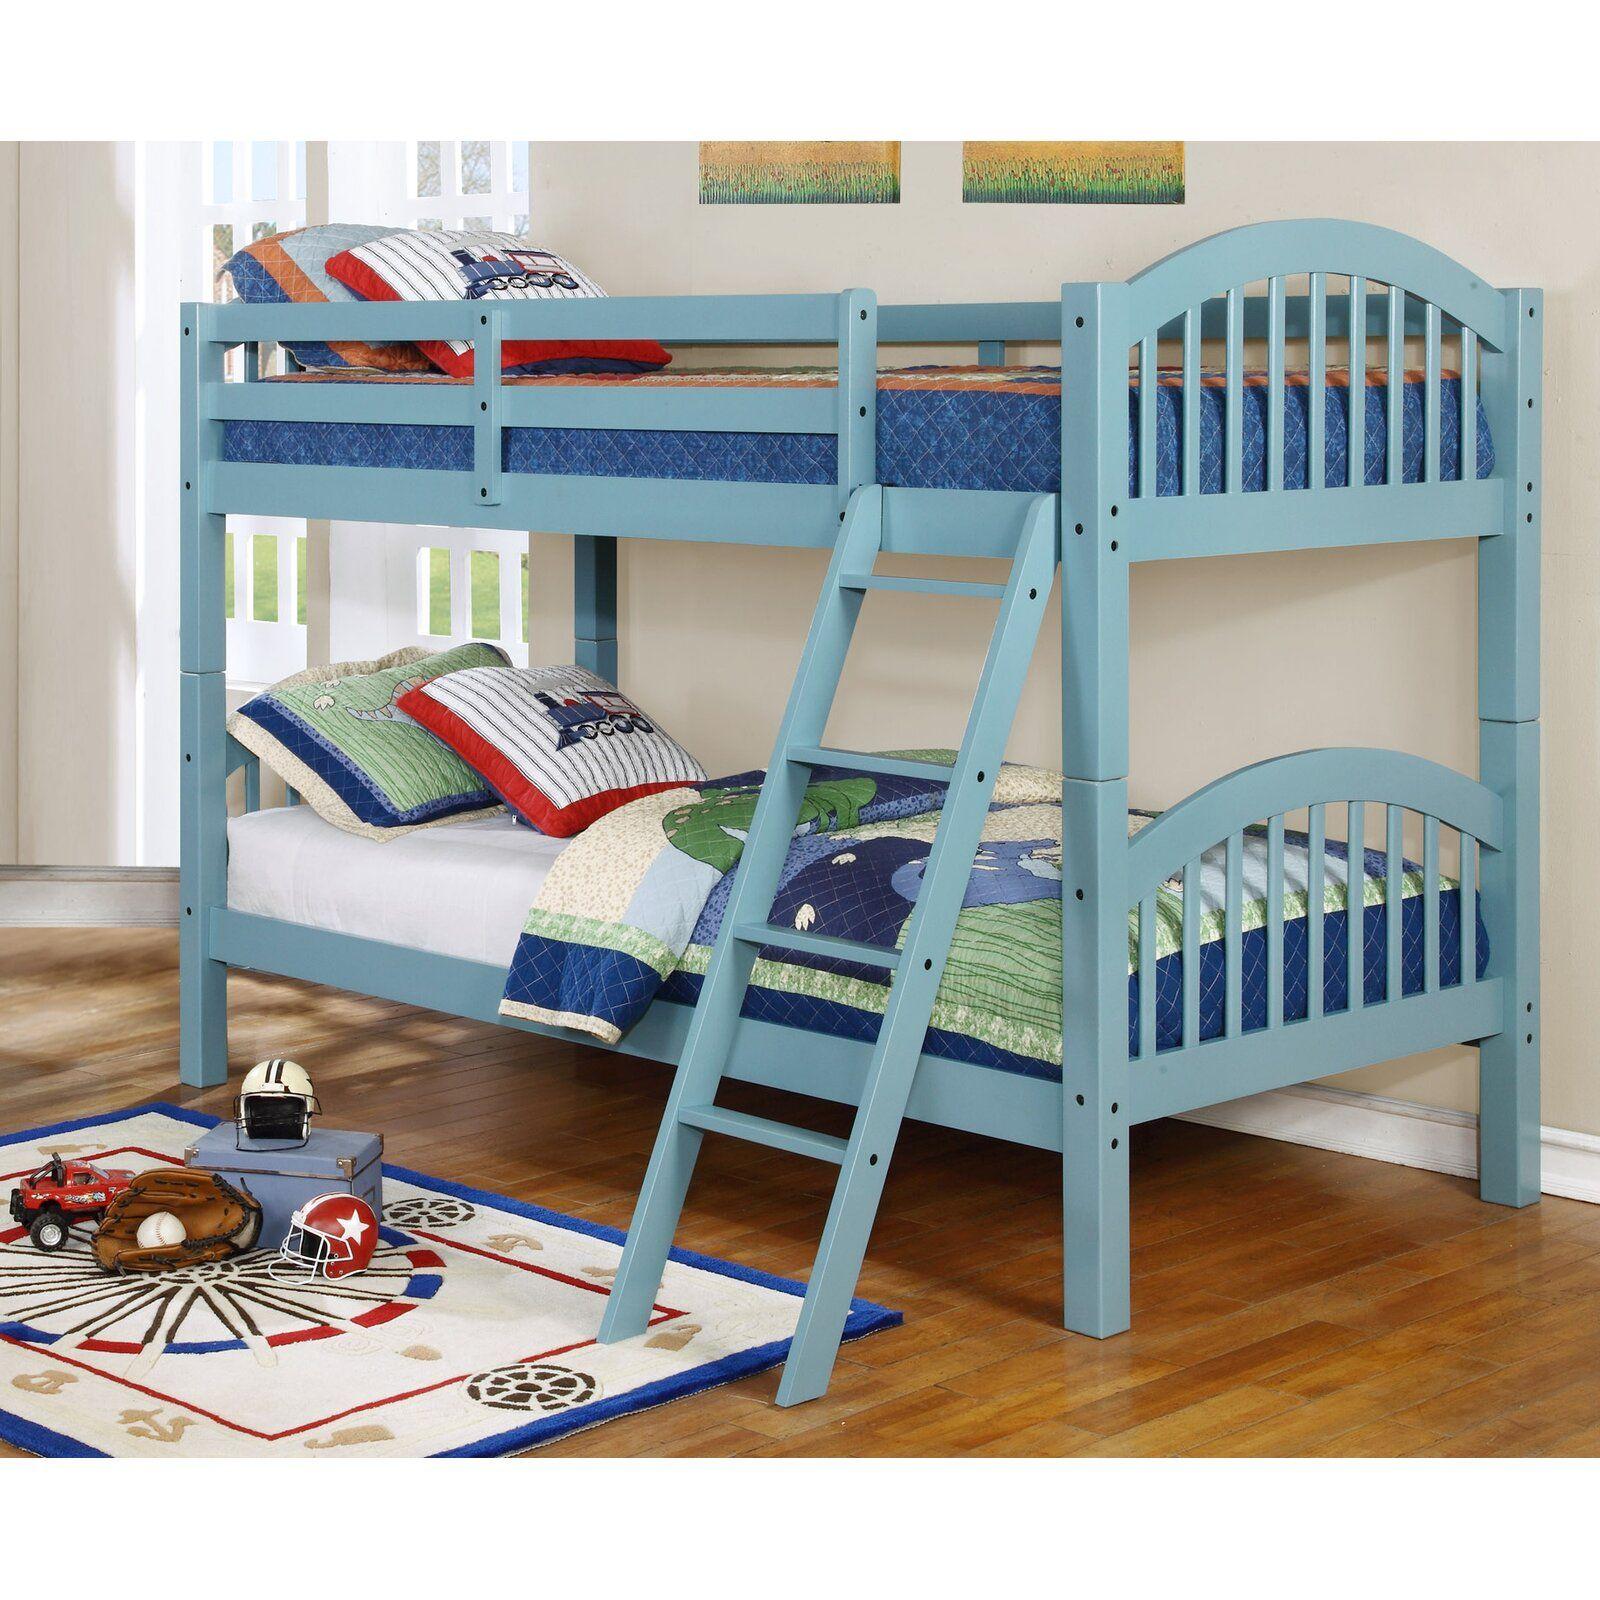 Viv Rae Susie Twin Over Twin Bunk Bed Wayfair Twin Bunk Beds Bunk Beds With Drawers Bunk Beds